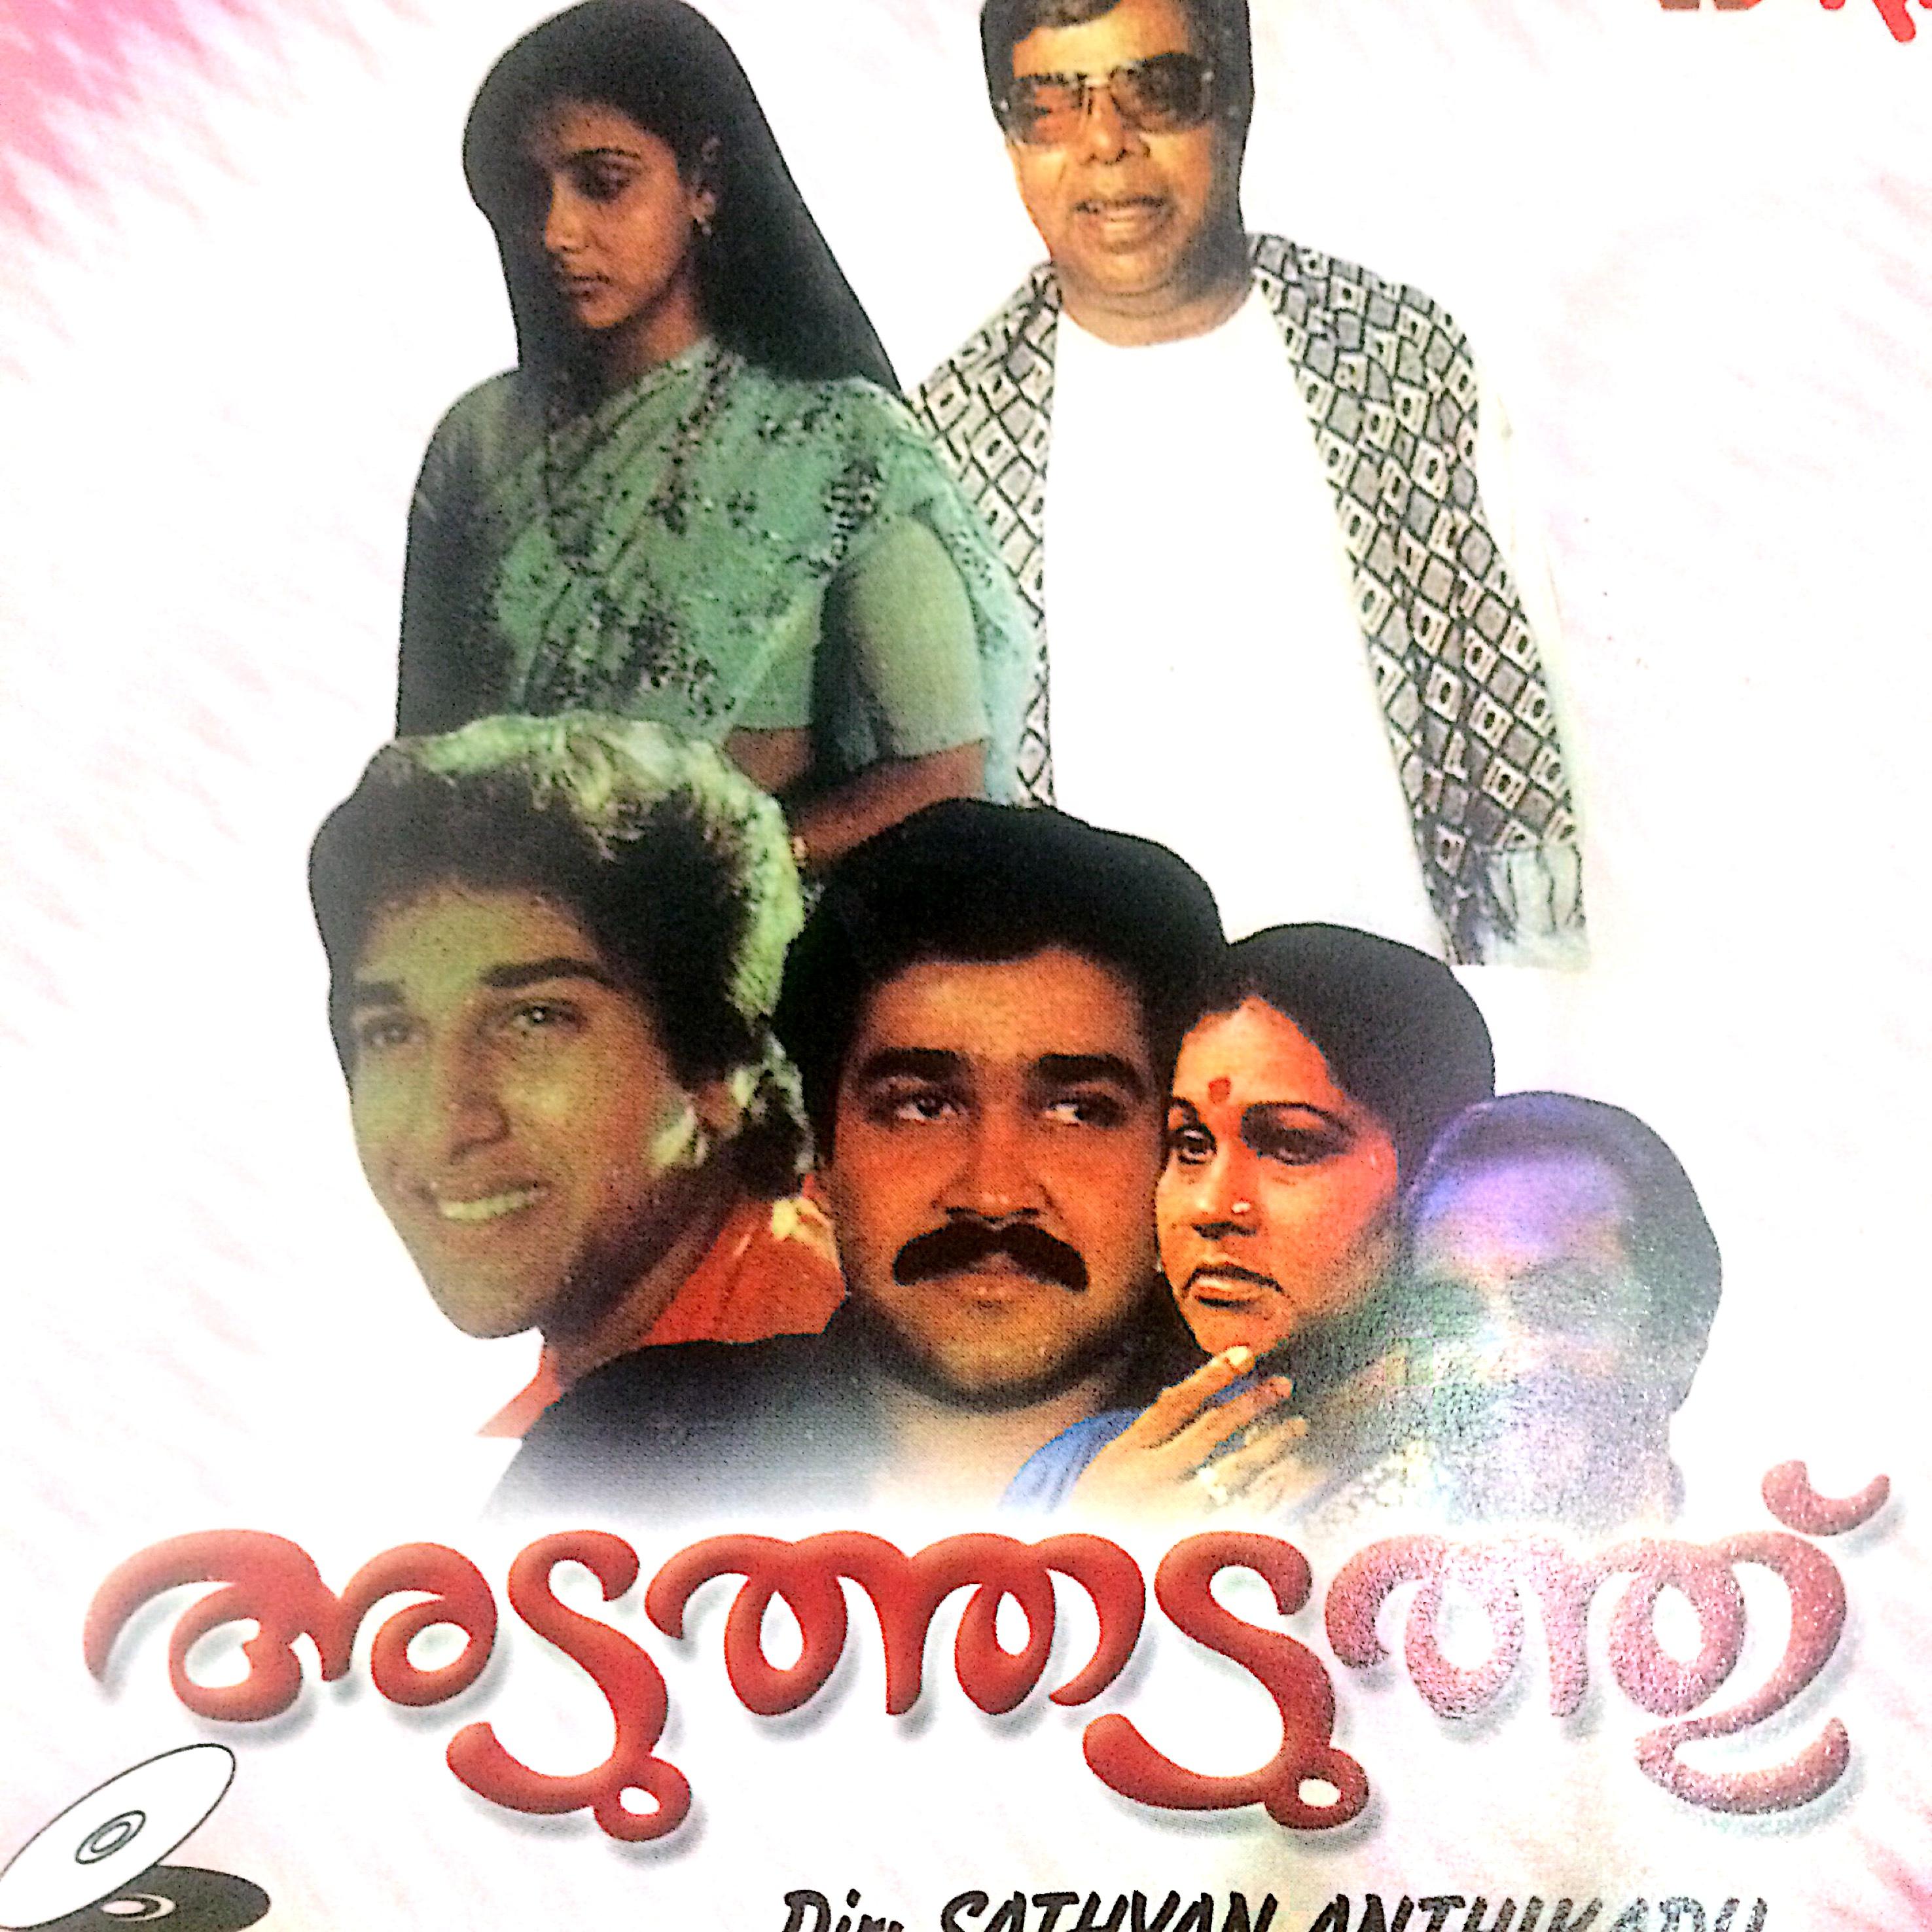 Aduthaduthu ((1984))